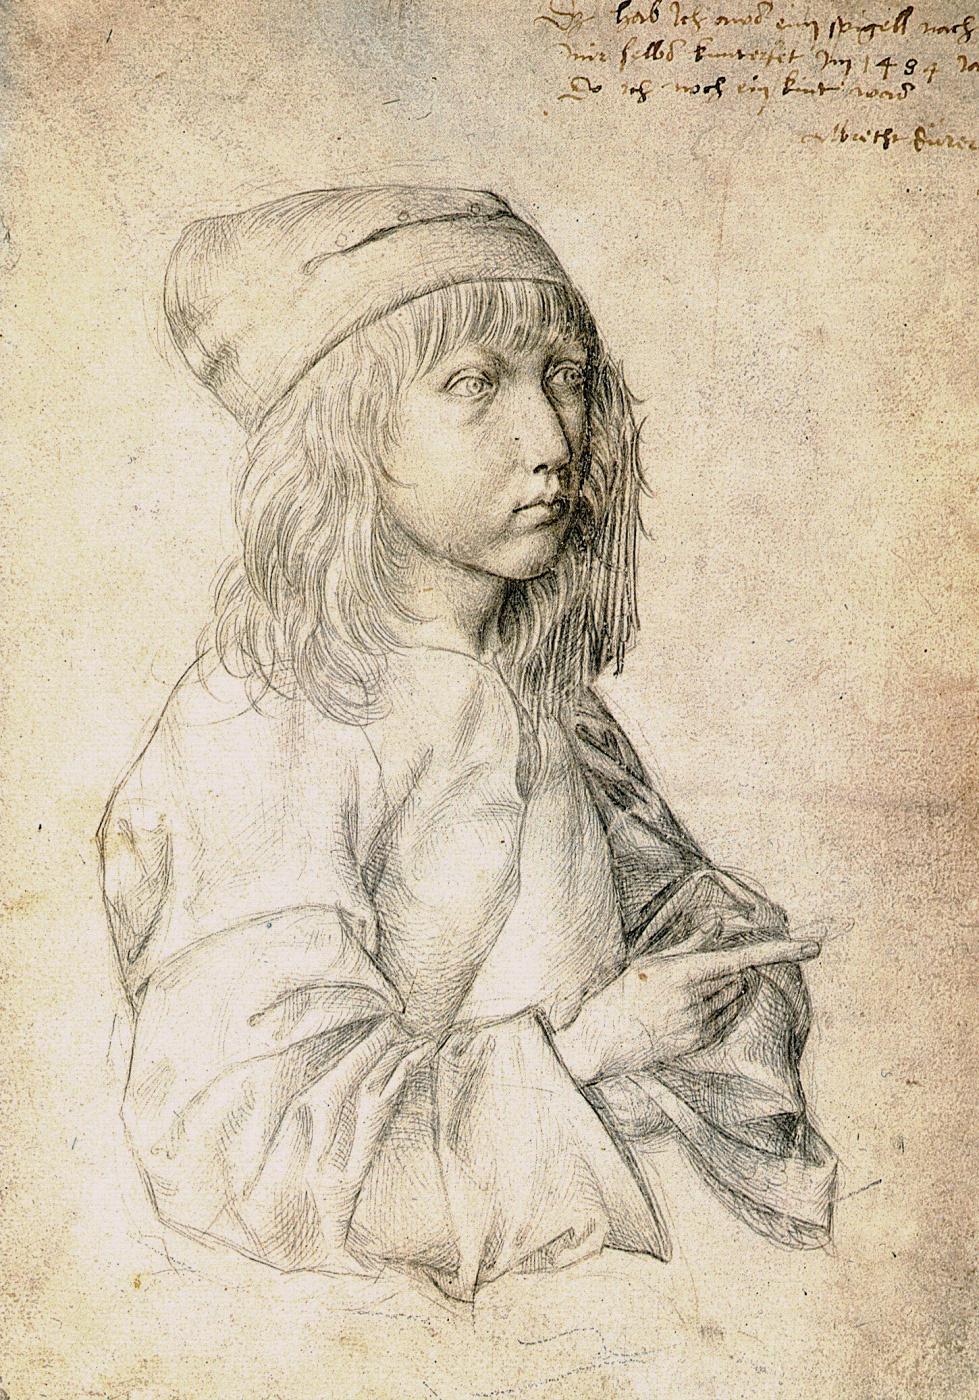 Albrecht Durer. Self-portrait at the age of 13